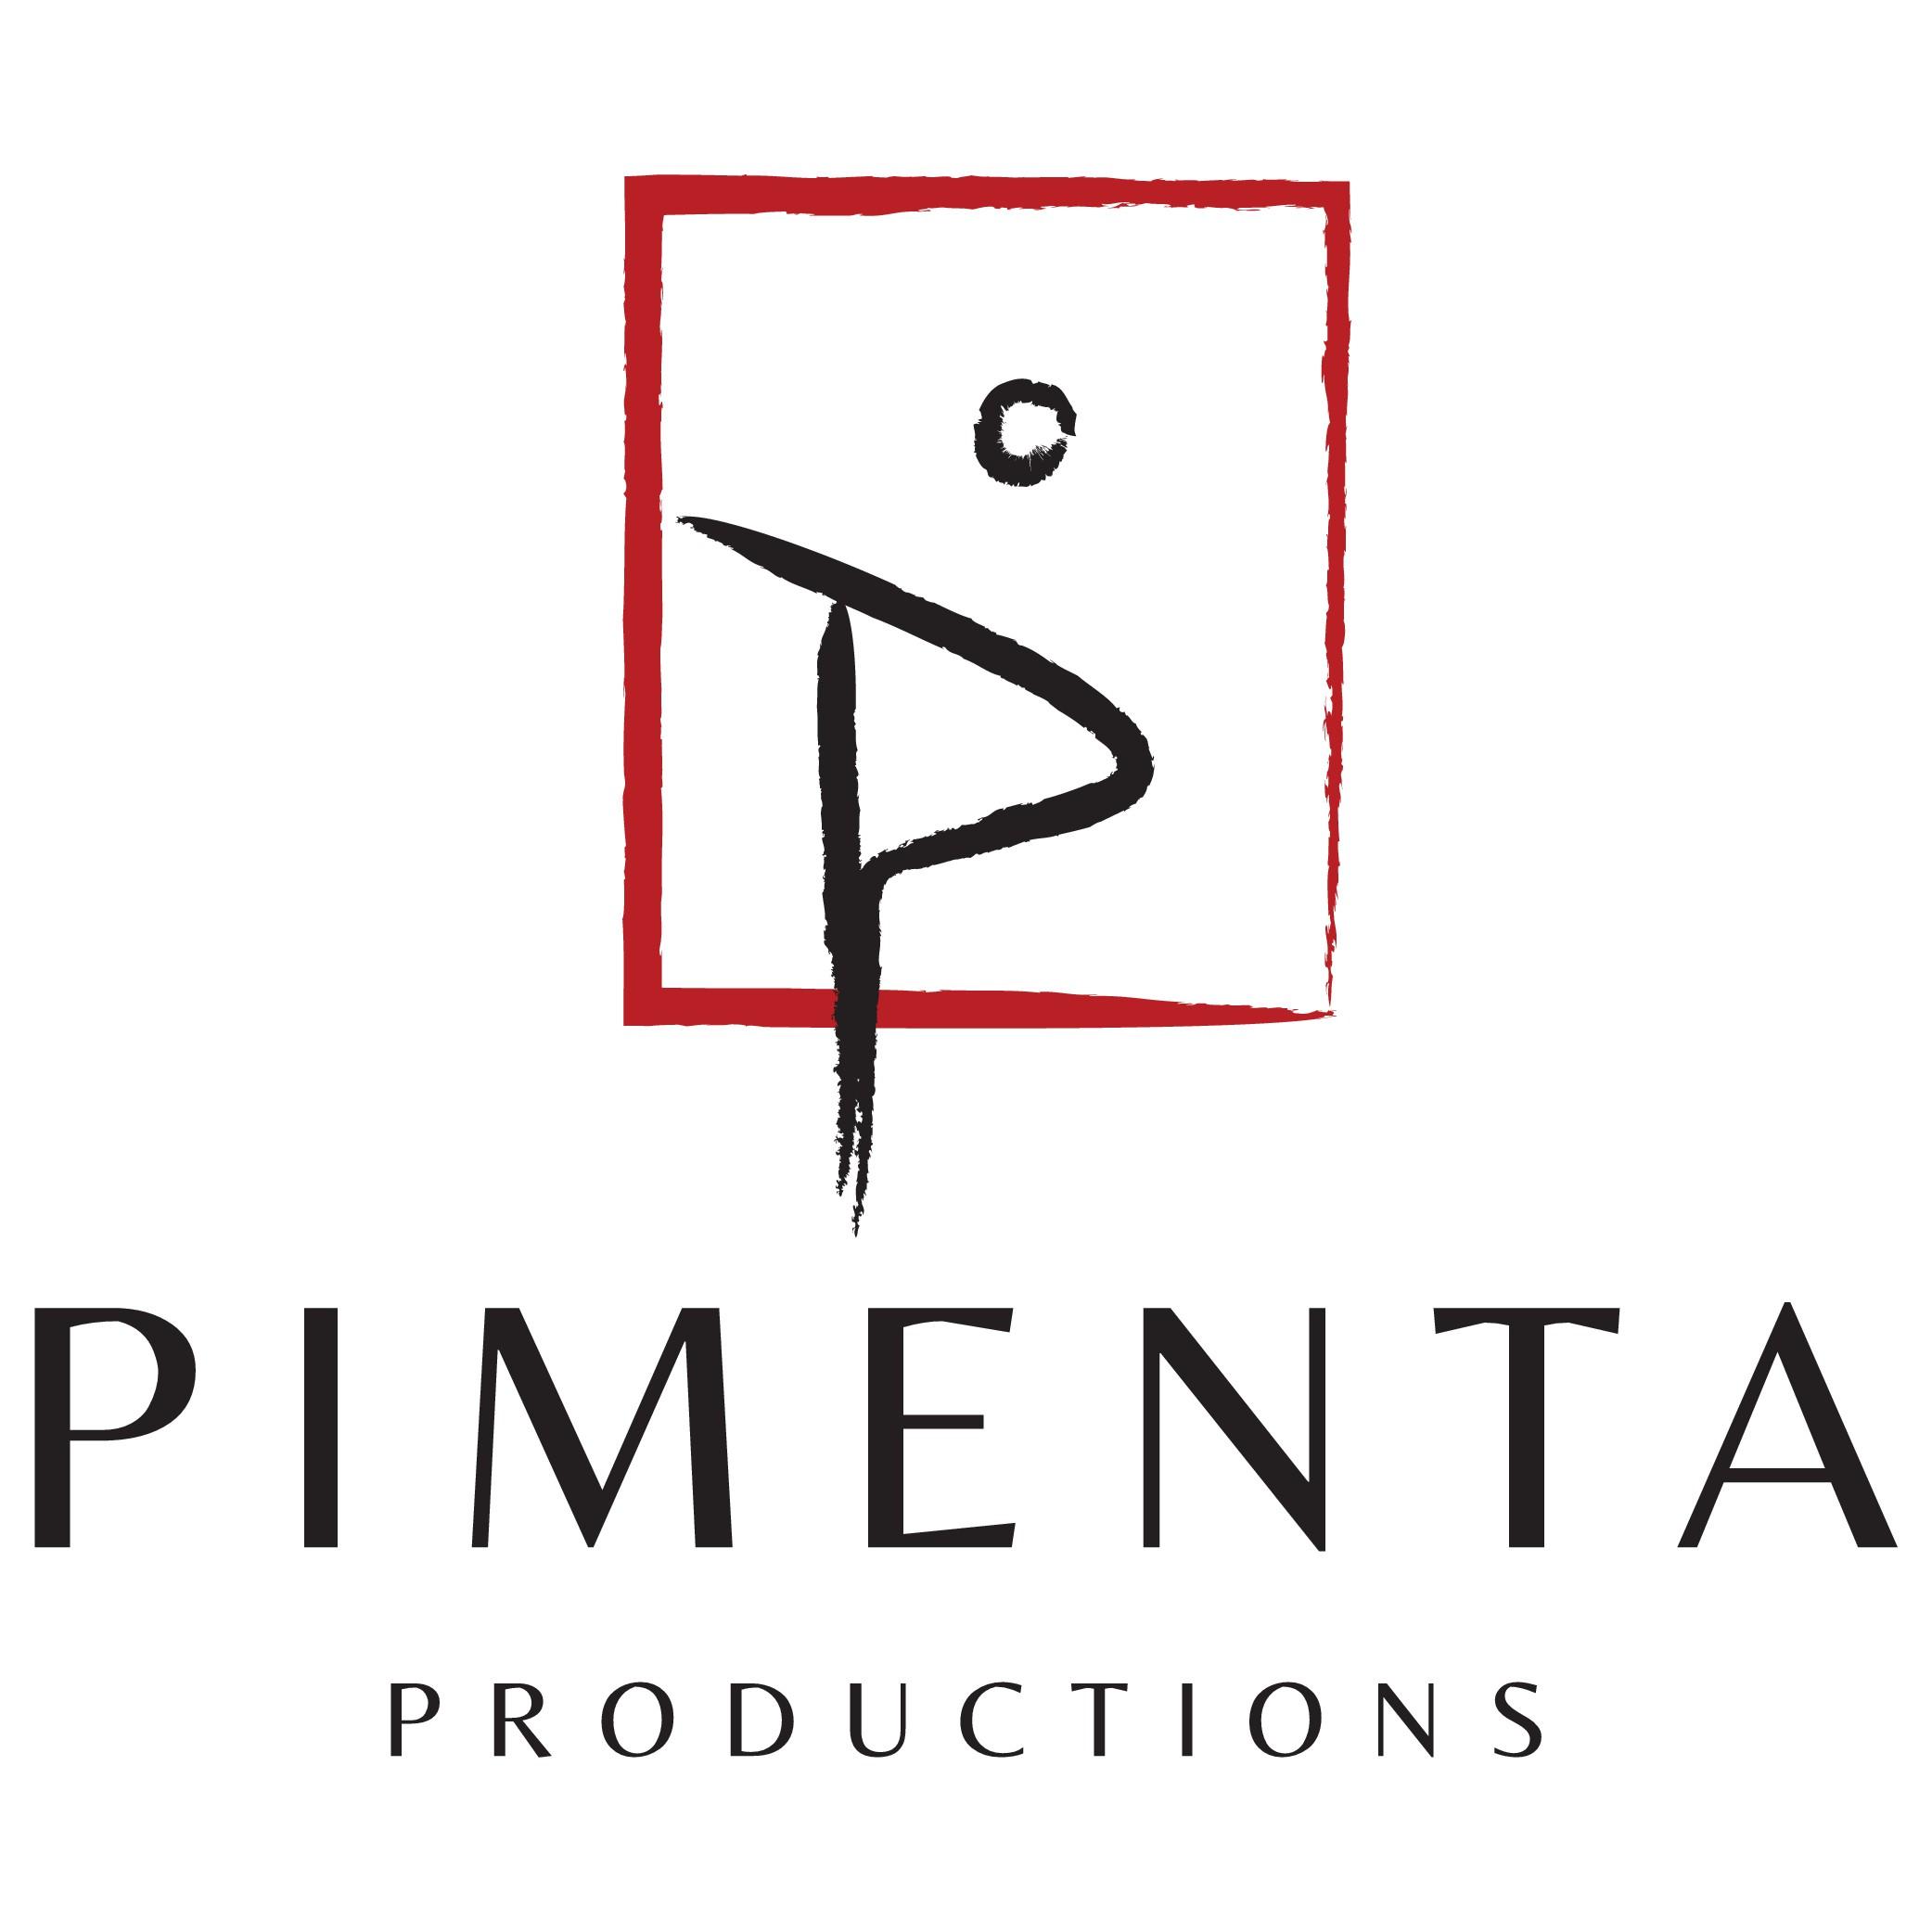 Create a fun logo for an artistic event fabrication company